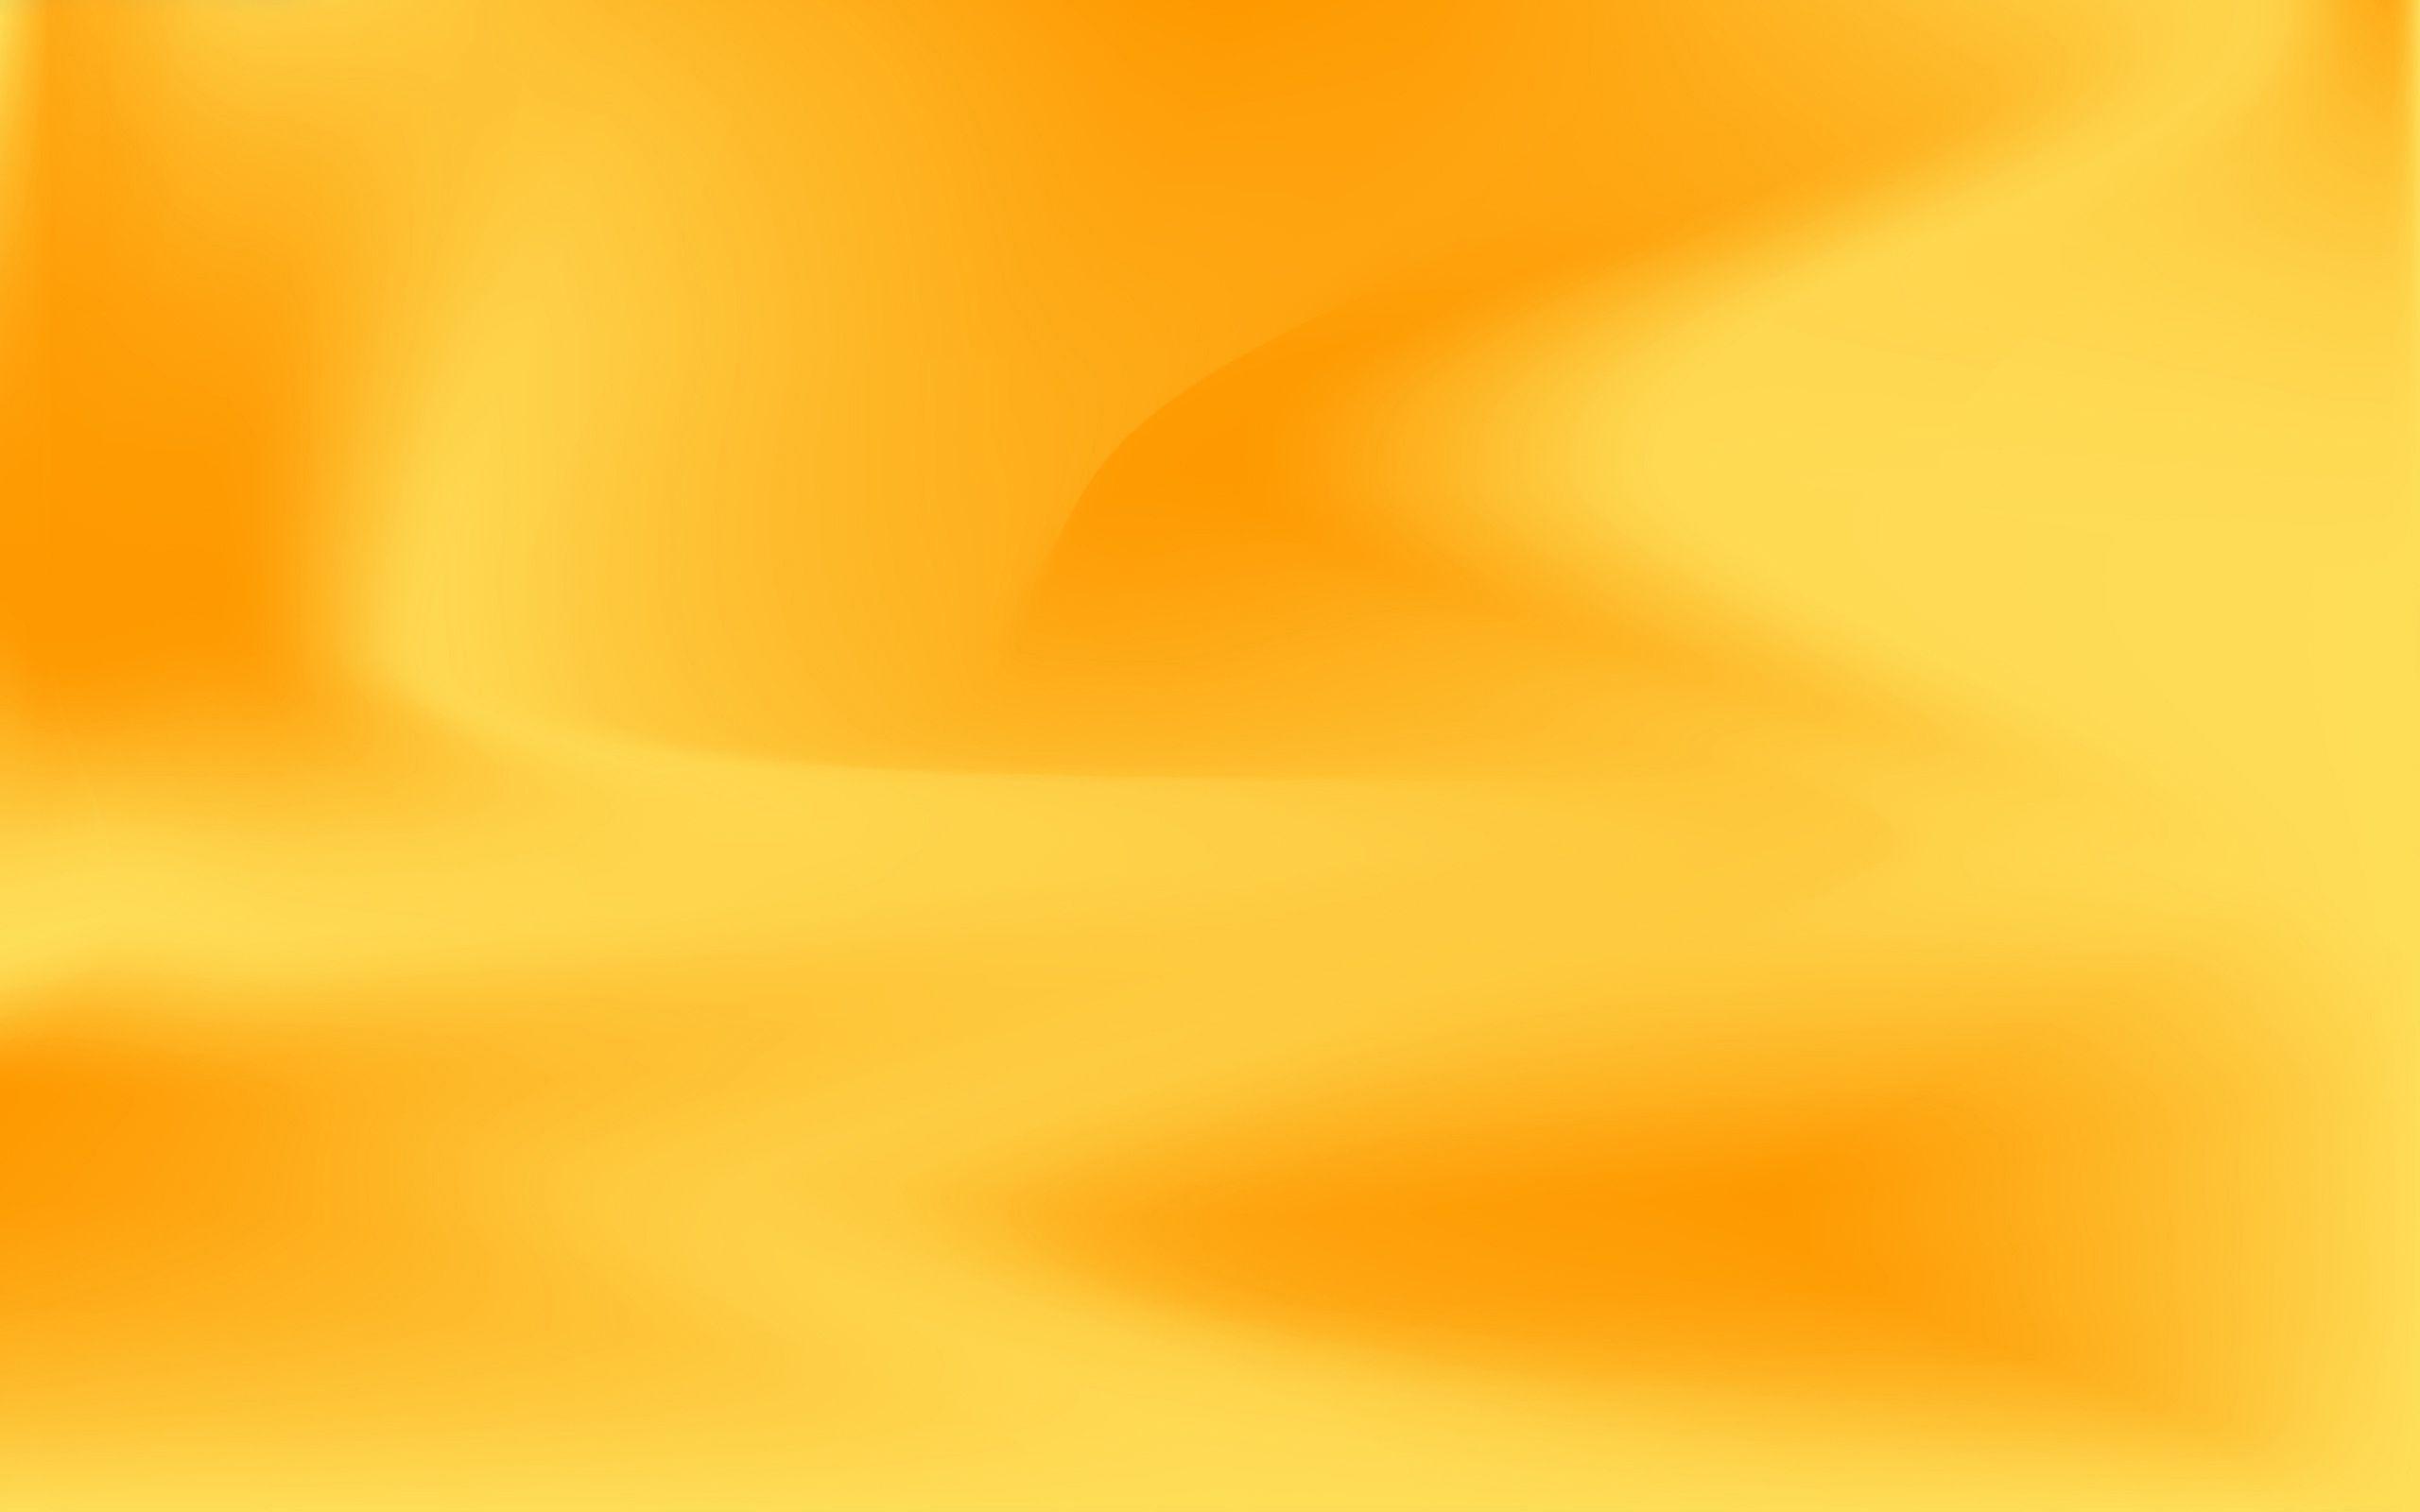 Free Download Yellow Word Google Search Yellow Orange